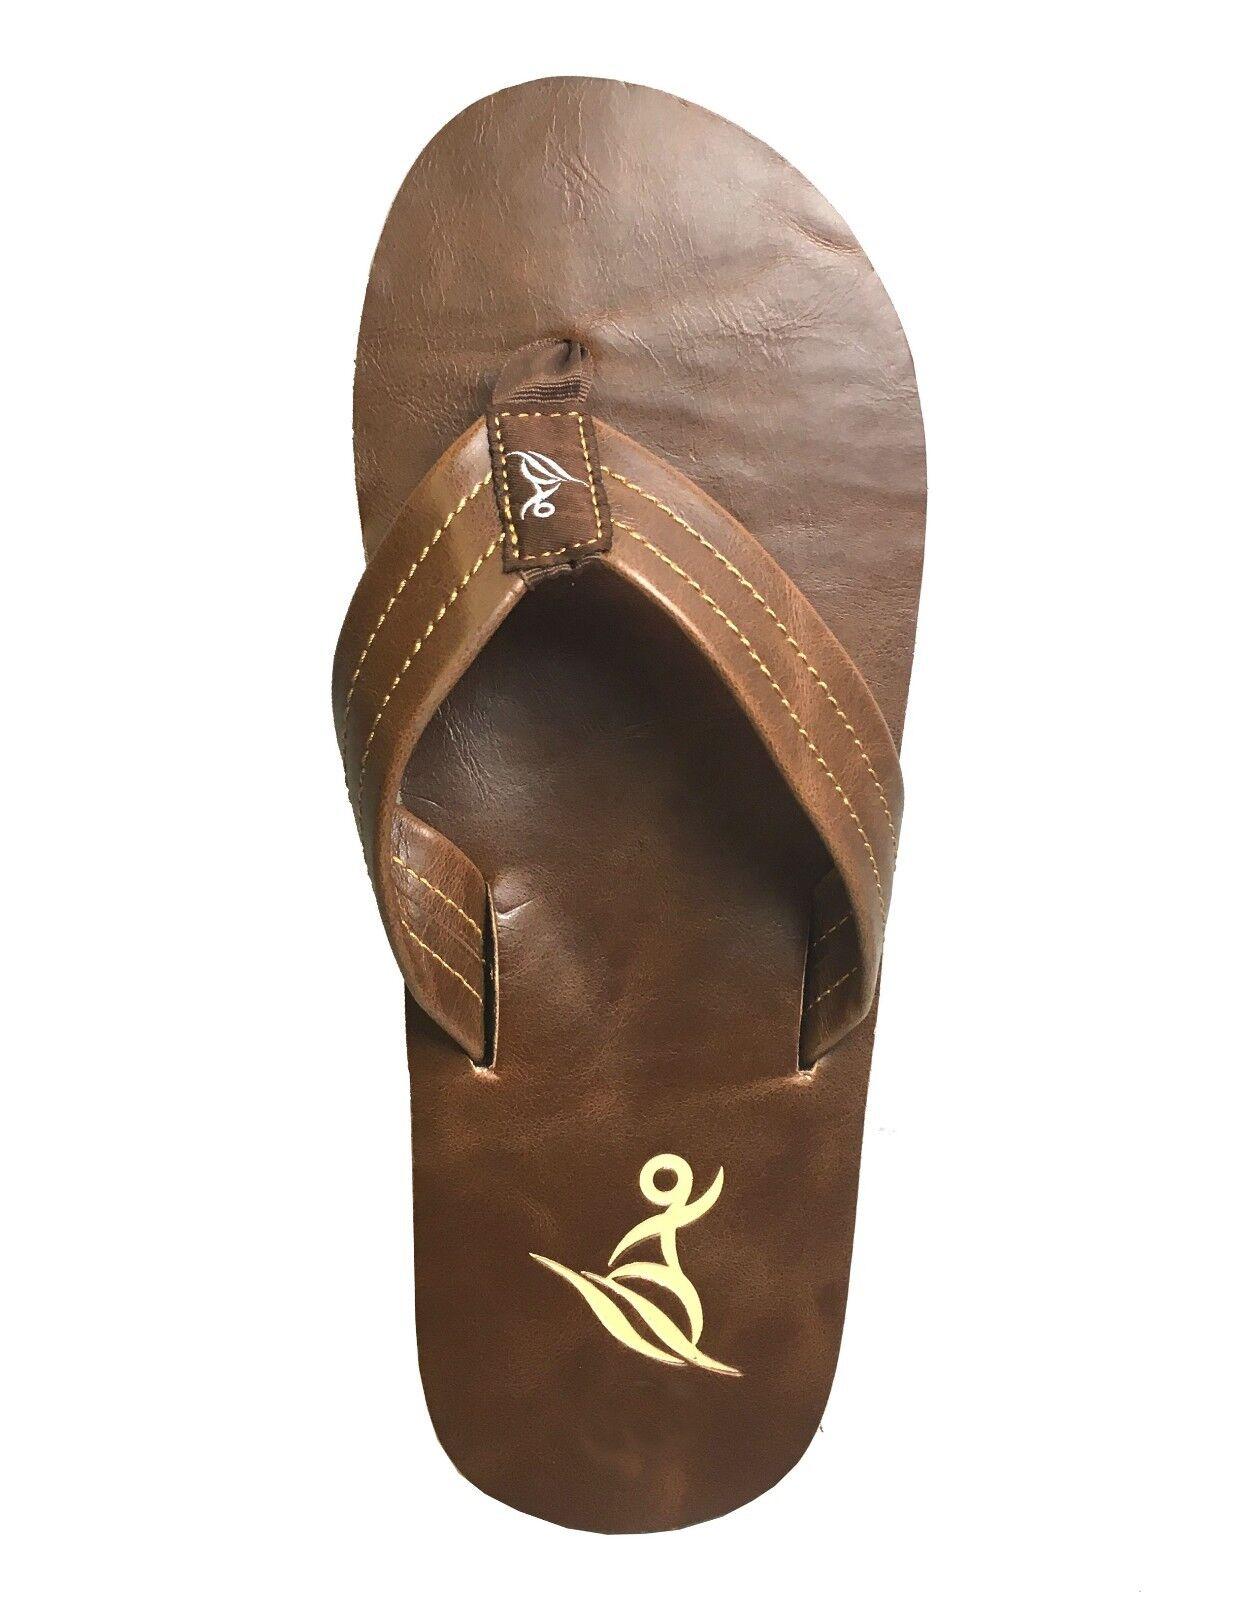 New MEN Stressed PU Sandals 7-13 Basic Flip Flop Size 7-13 Sandals Beach Gym.. ( 615 M ) c7830d